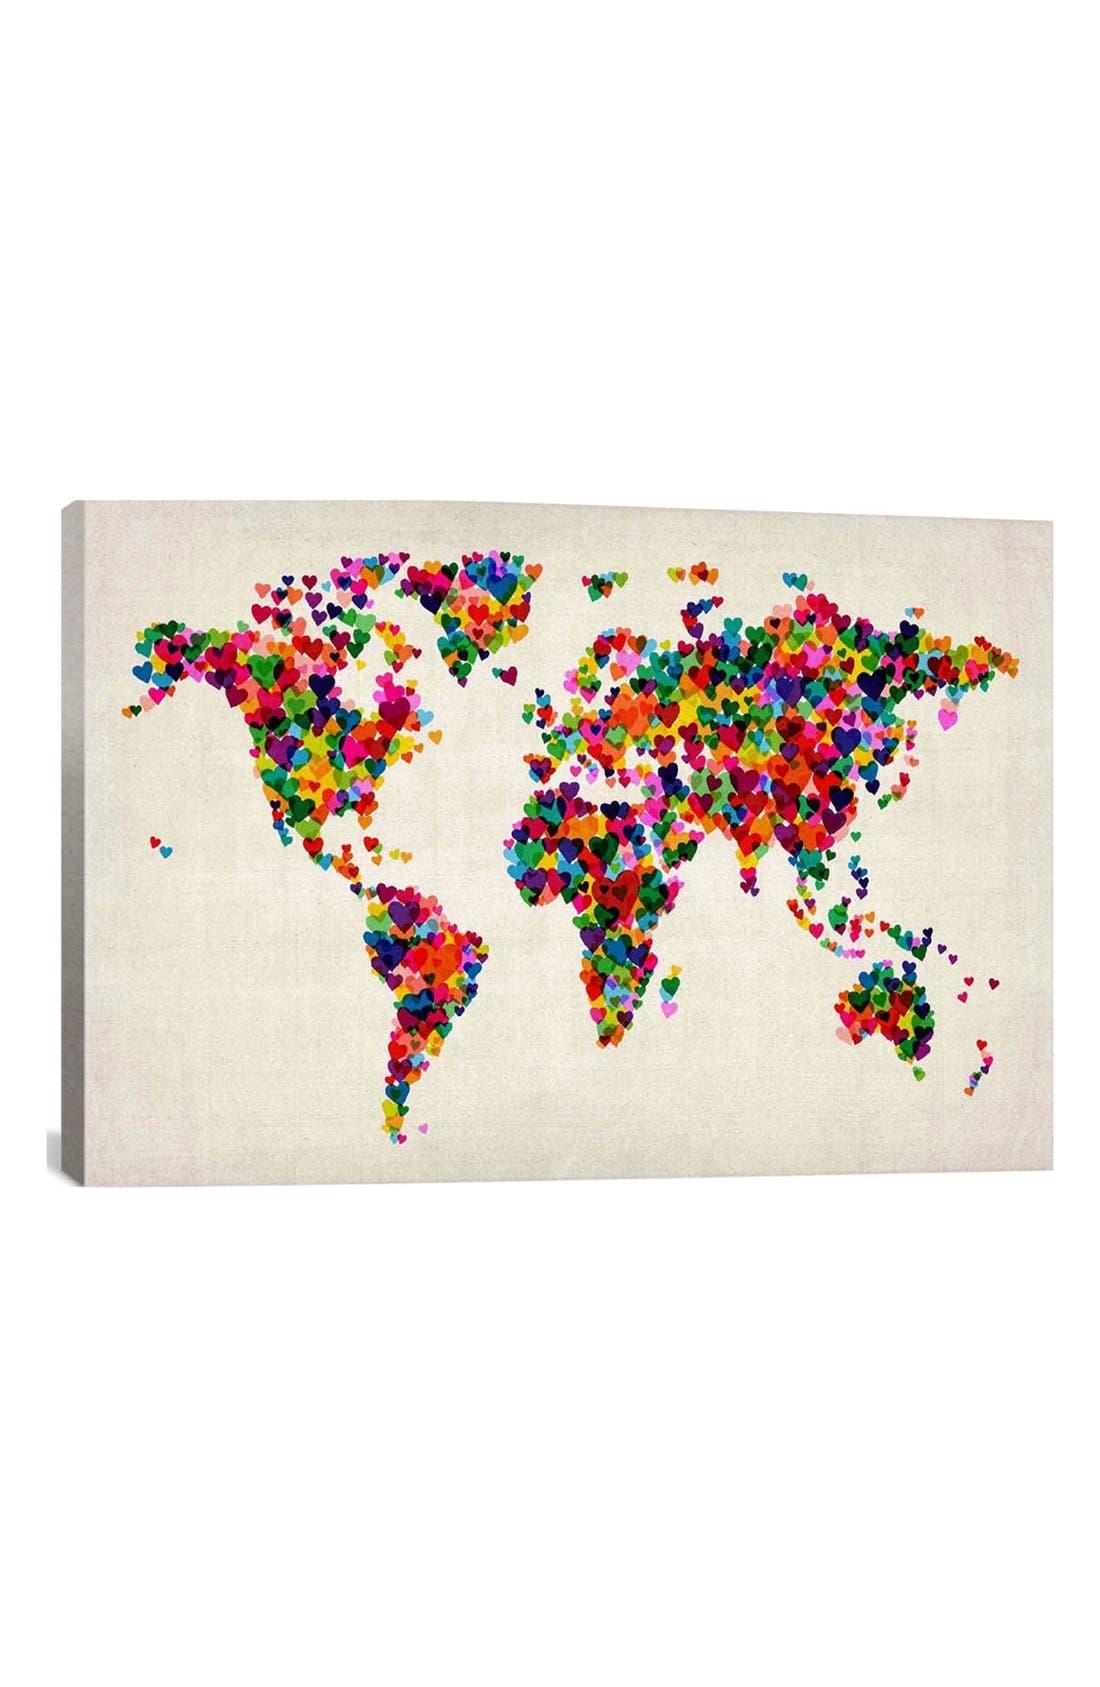 'World Map Hearts - Michael Thompsett' Giclée Print Canvas Art,                         Main,                         color, White/ Multi